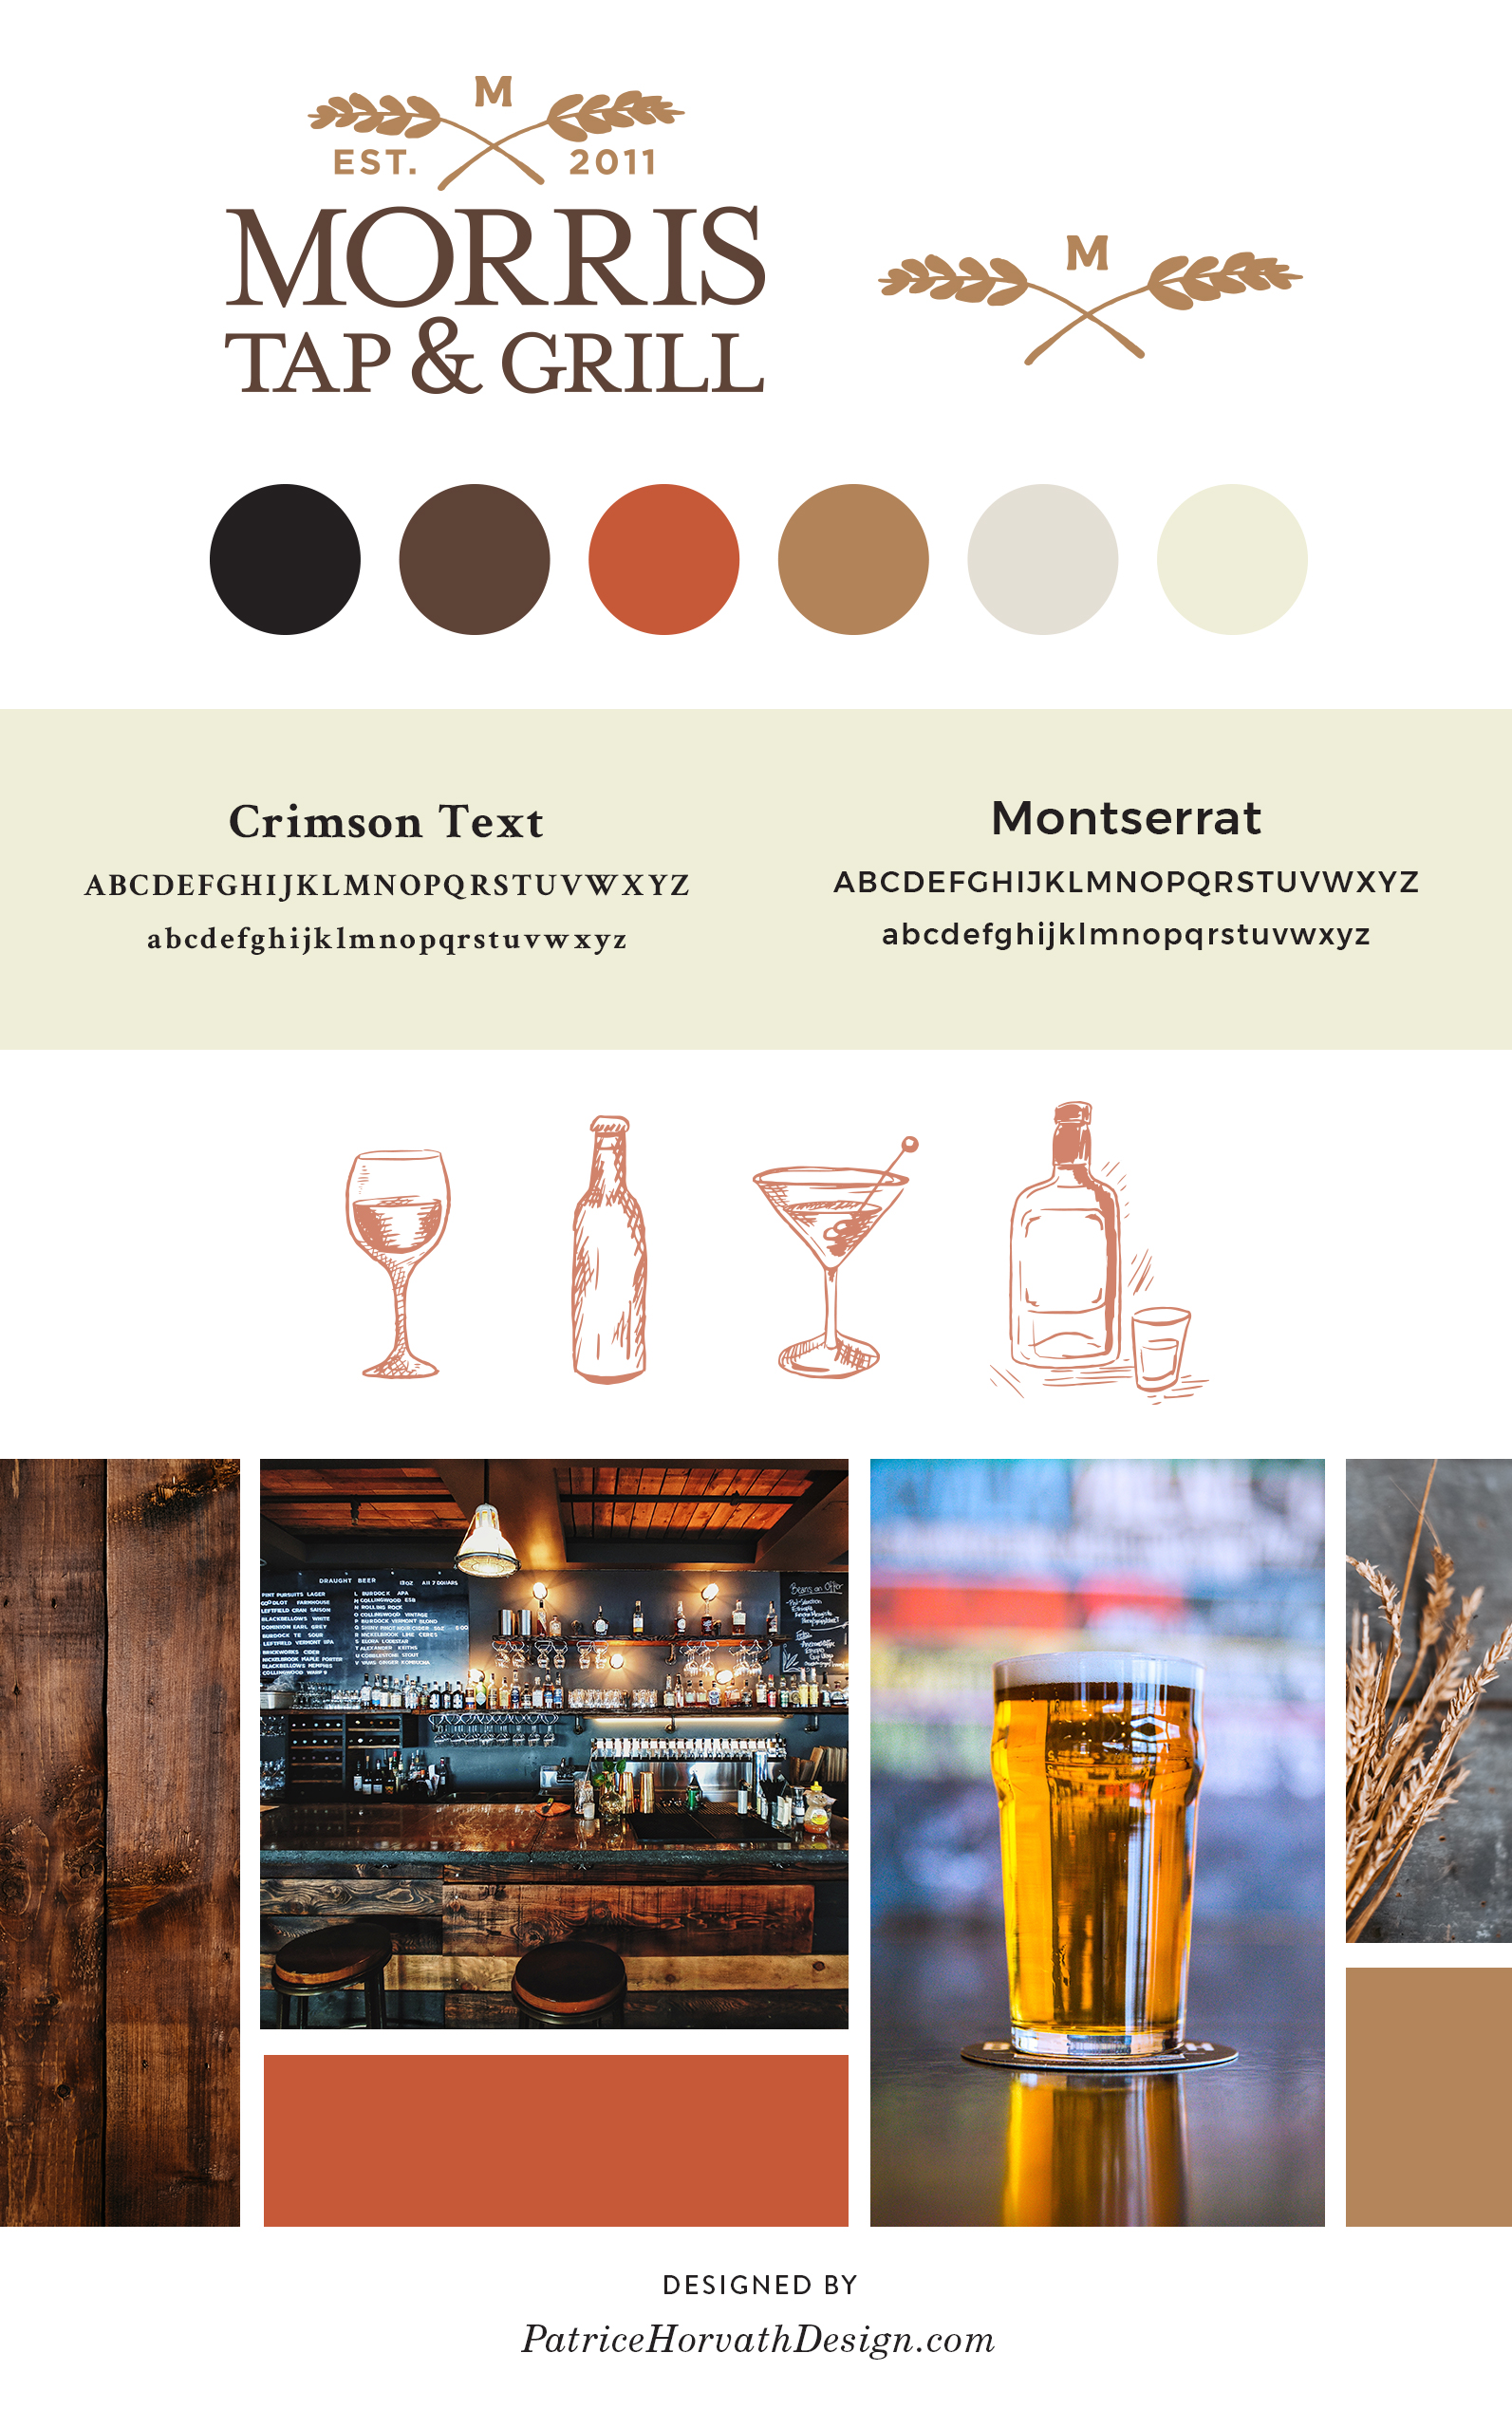 Morris_Tap_Grill_Branding_Bar.jpg